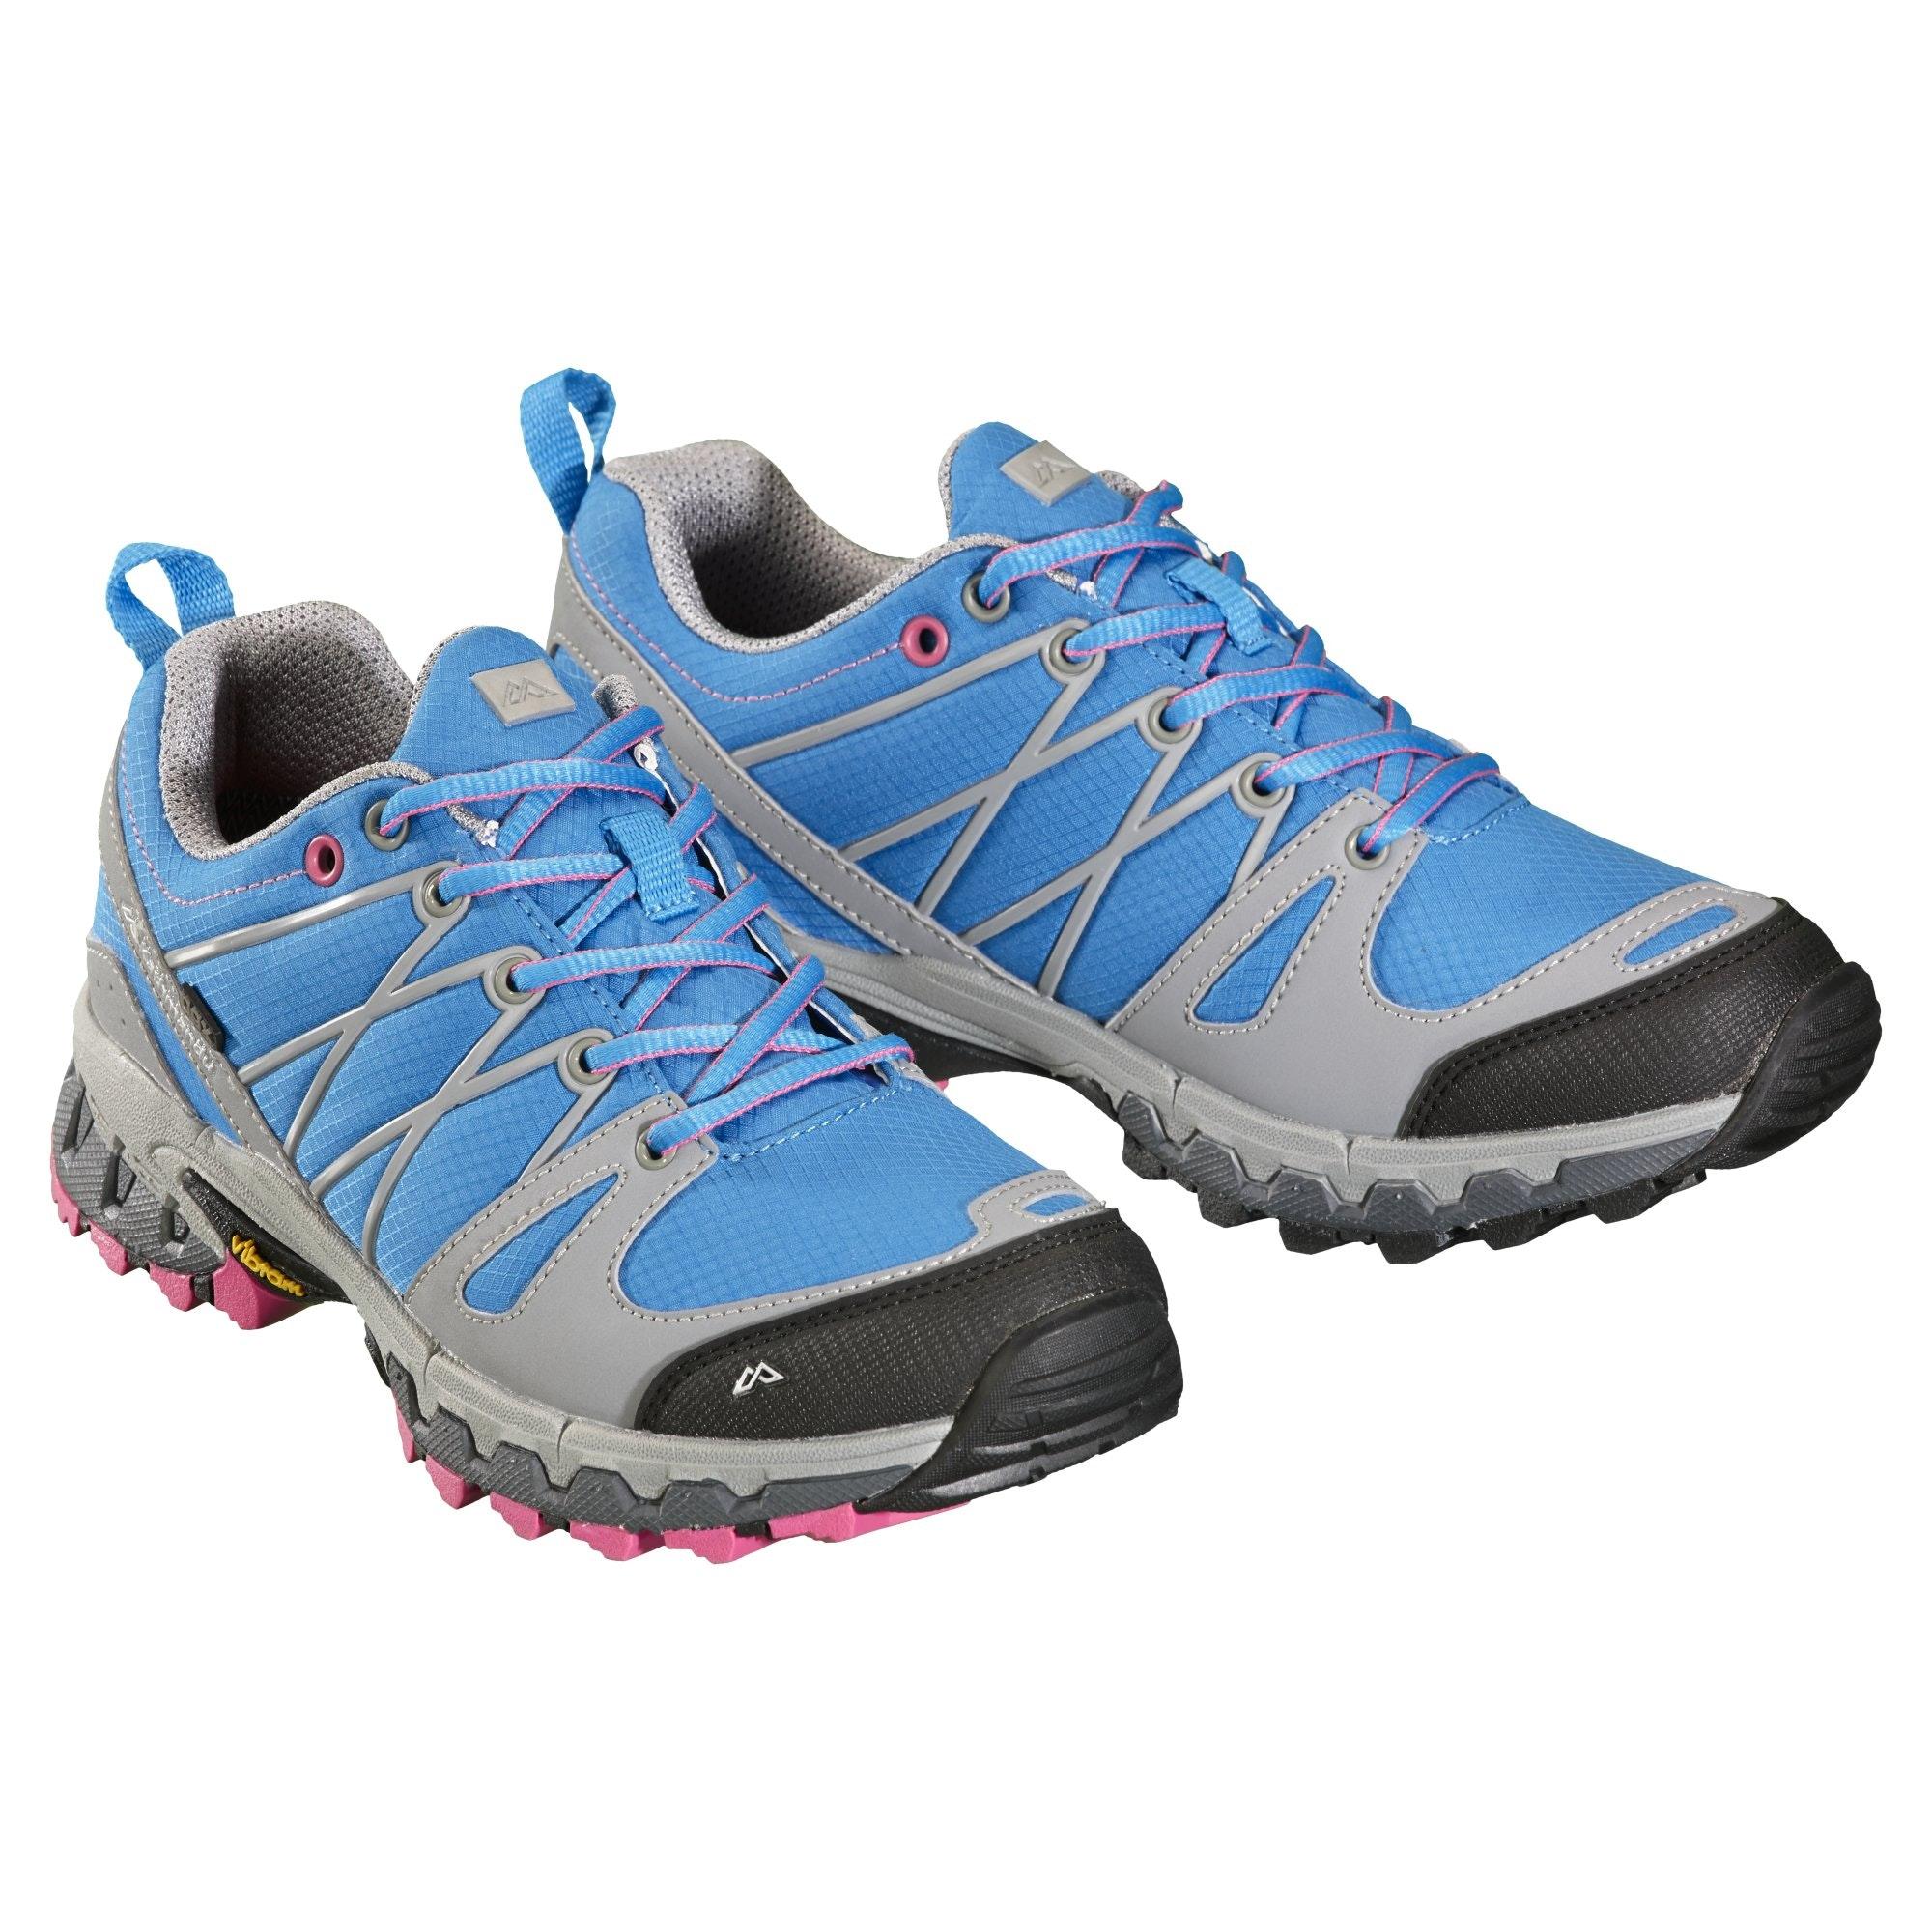 Kathmandu Running Shoes